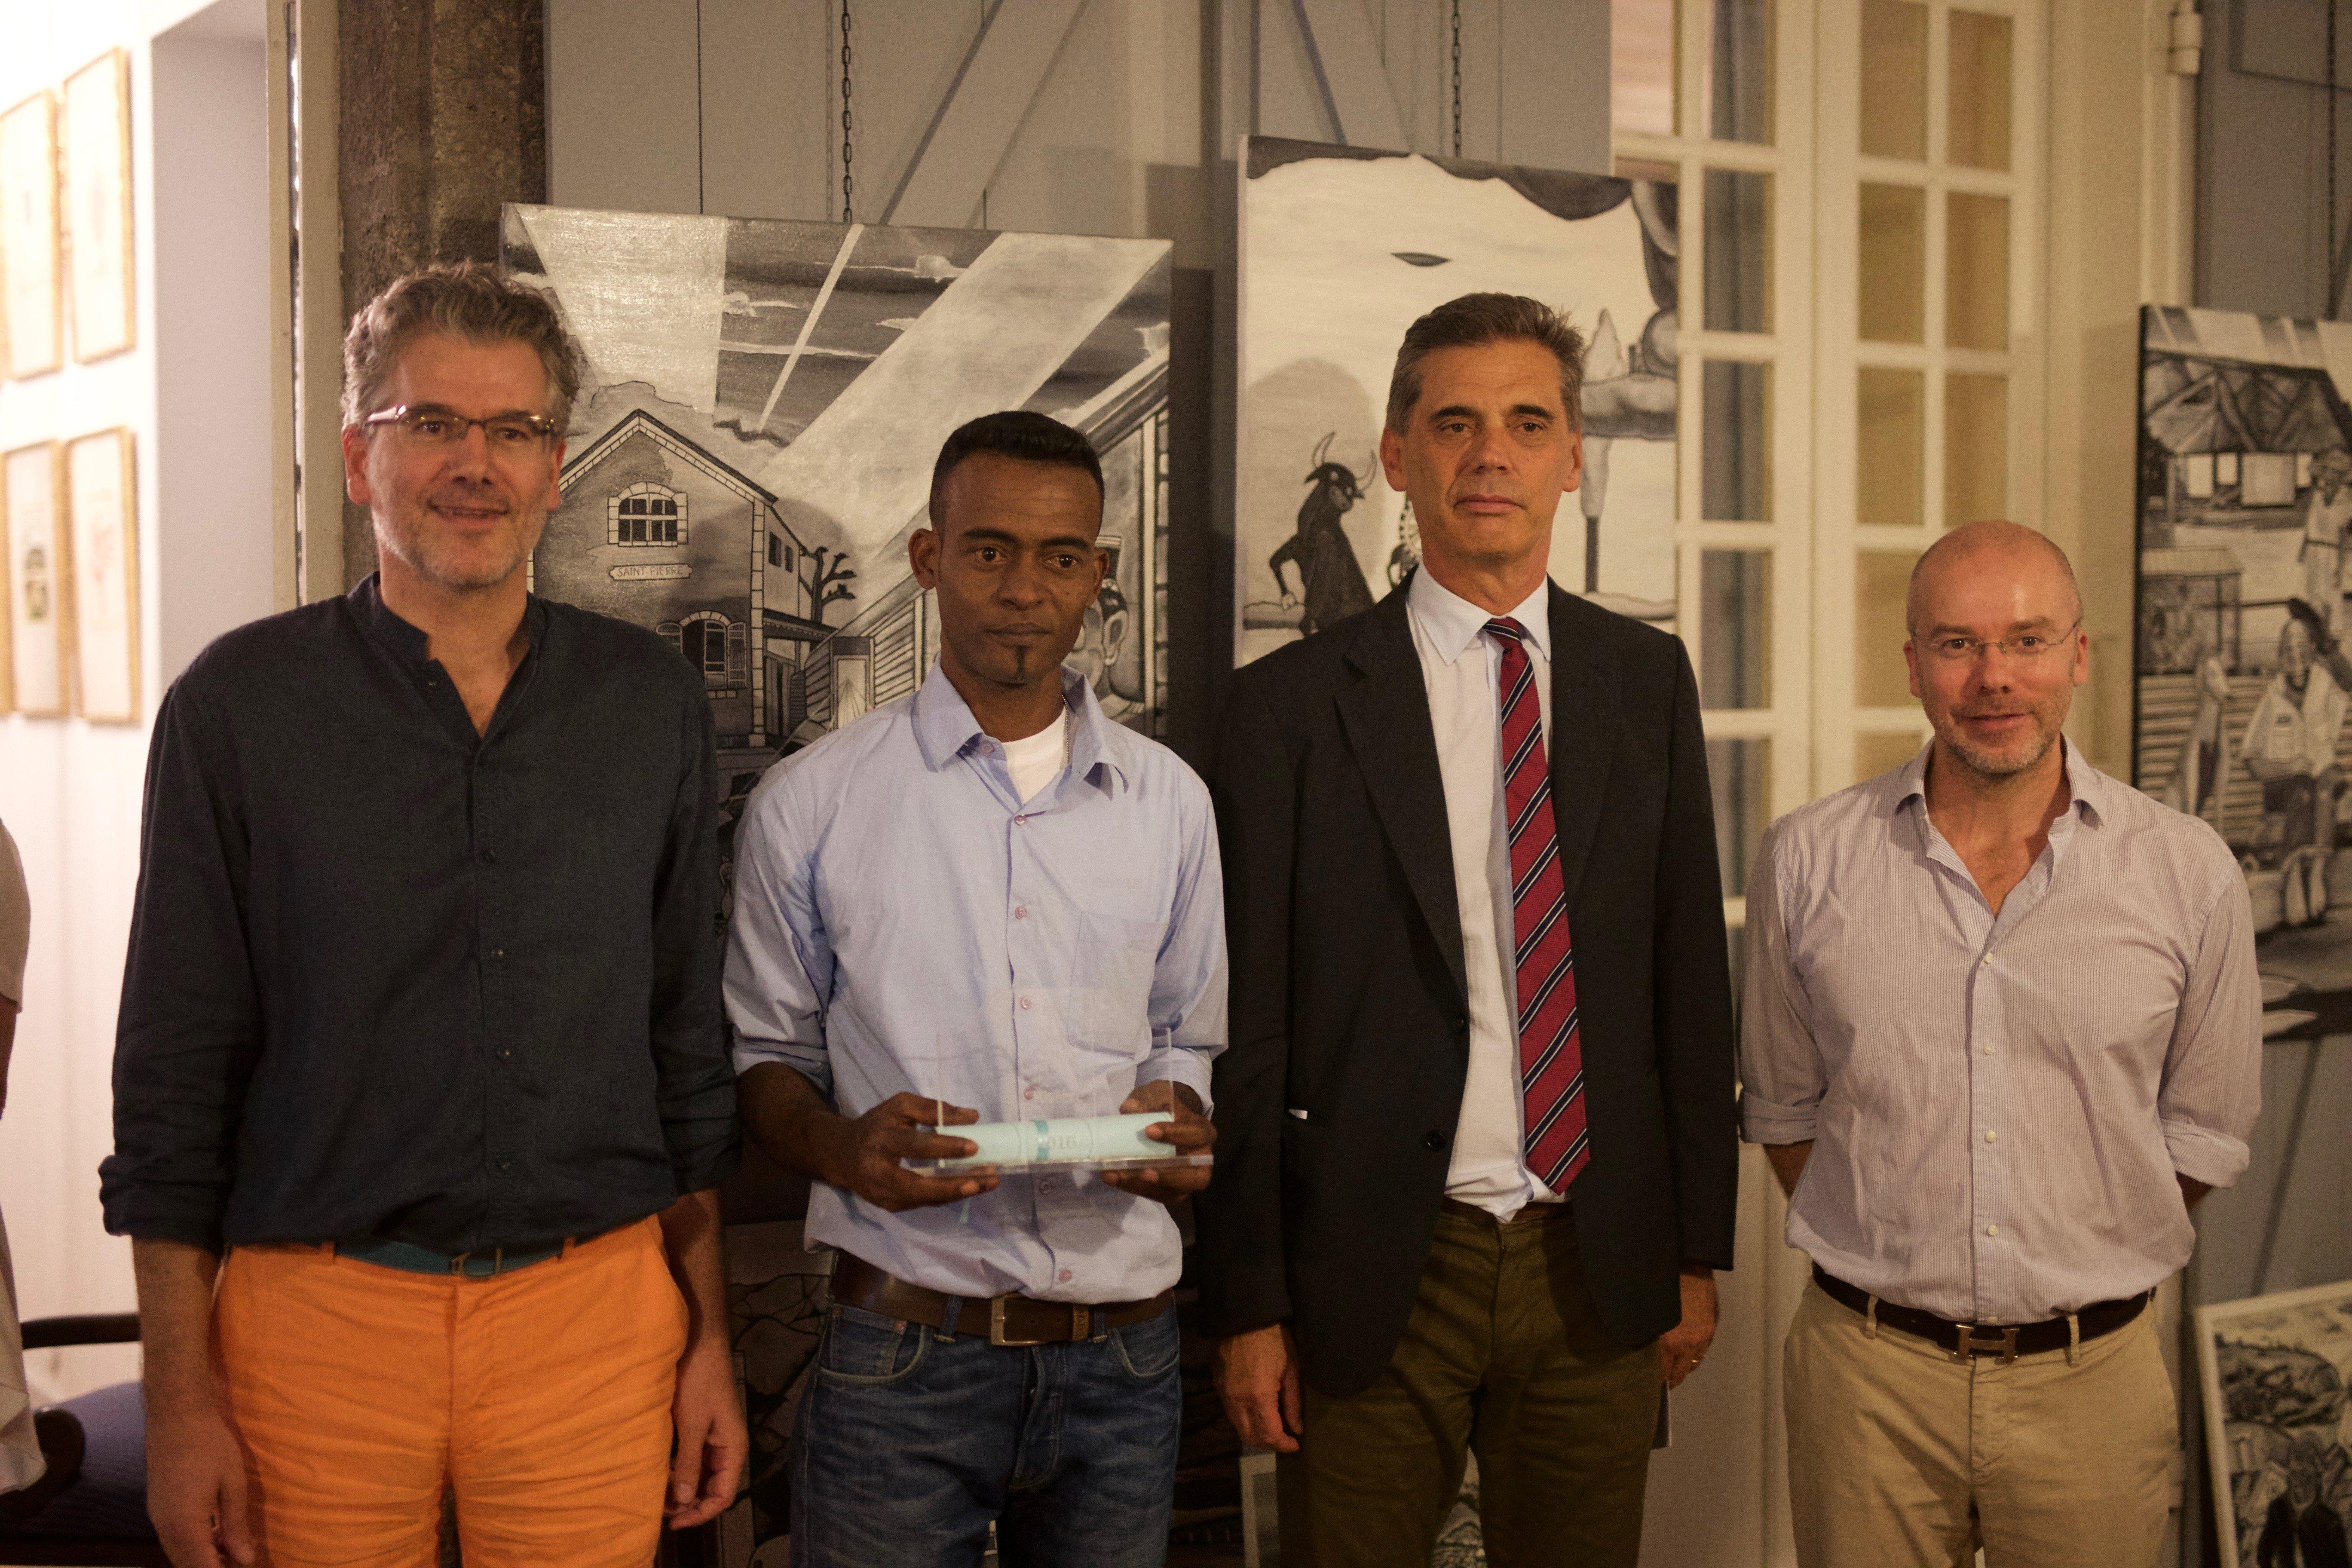 De gauche à droite, Louis FAGNIEZ, Rivelino MAMMOSA, M. Dominique SORAIN, M.Marin RIVIERE